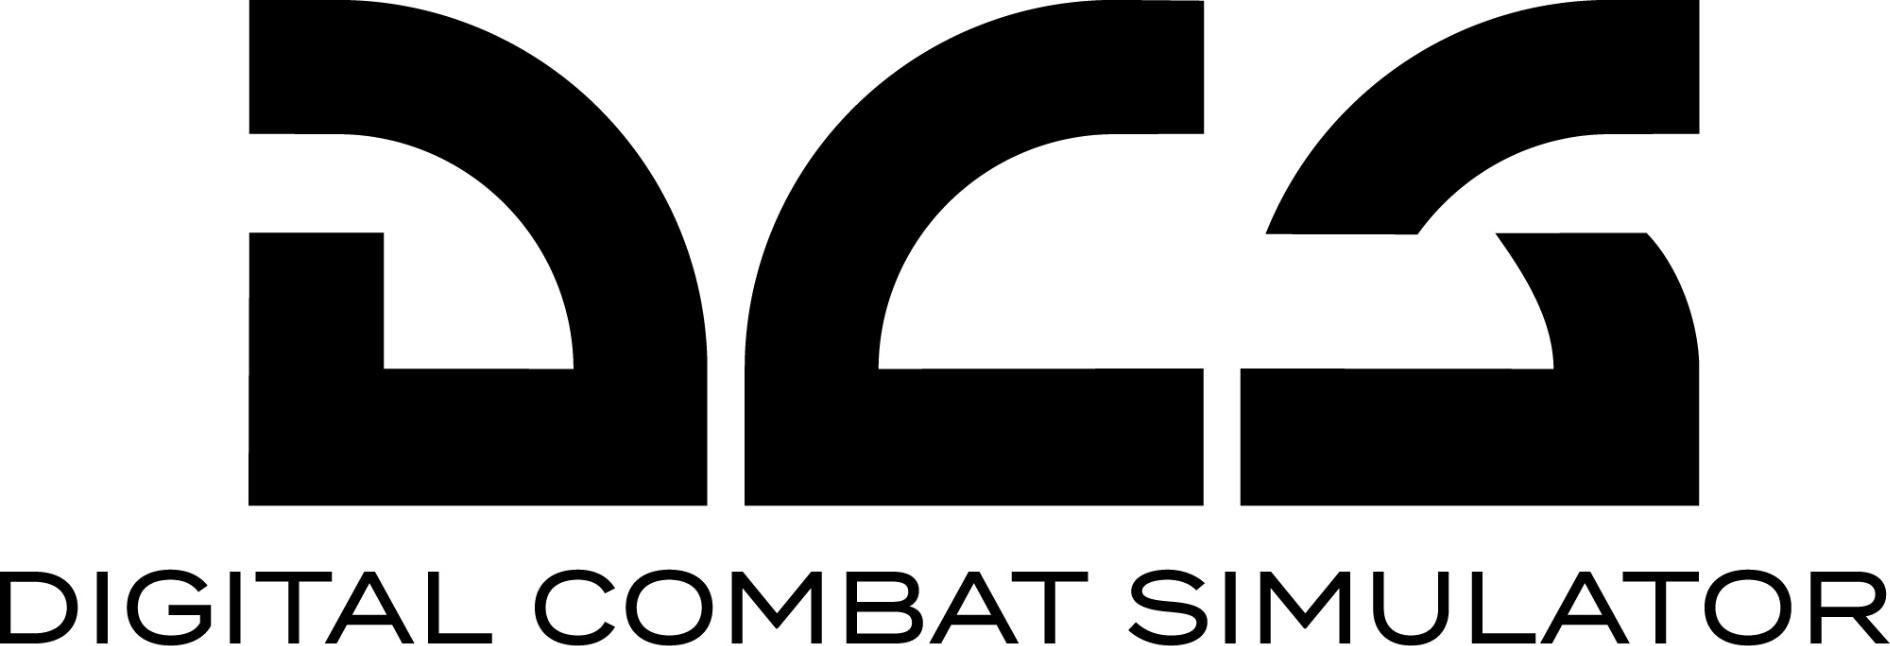 DCS Digital Combat Simulator